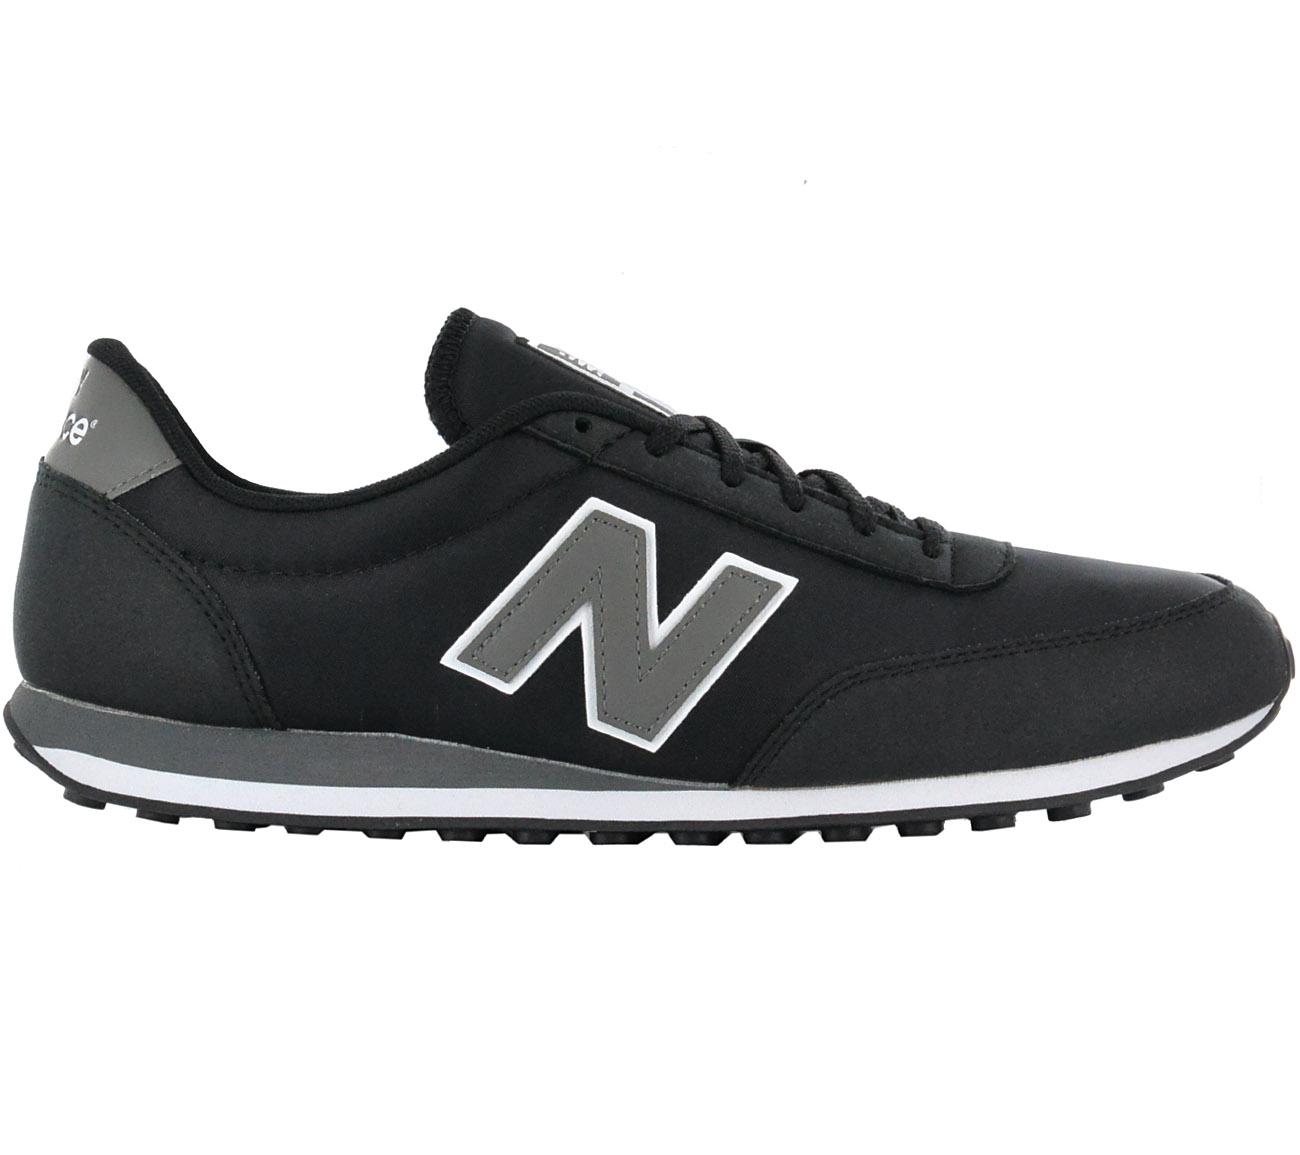 new balance 410 sneakers black